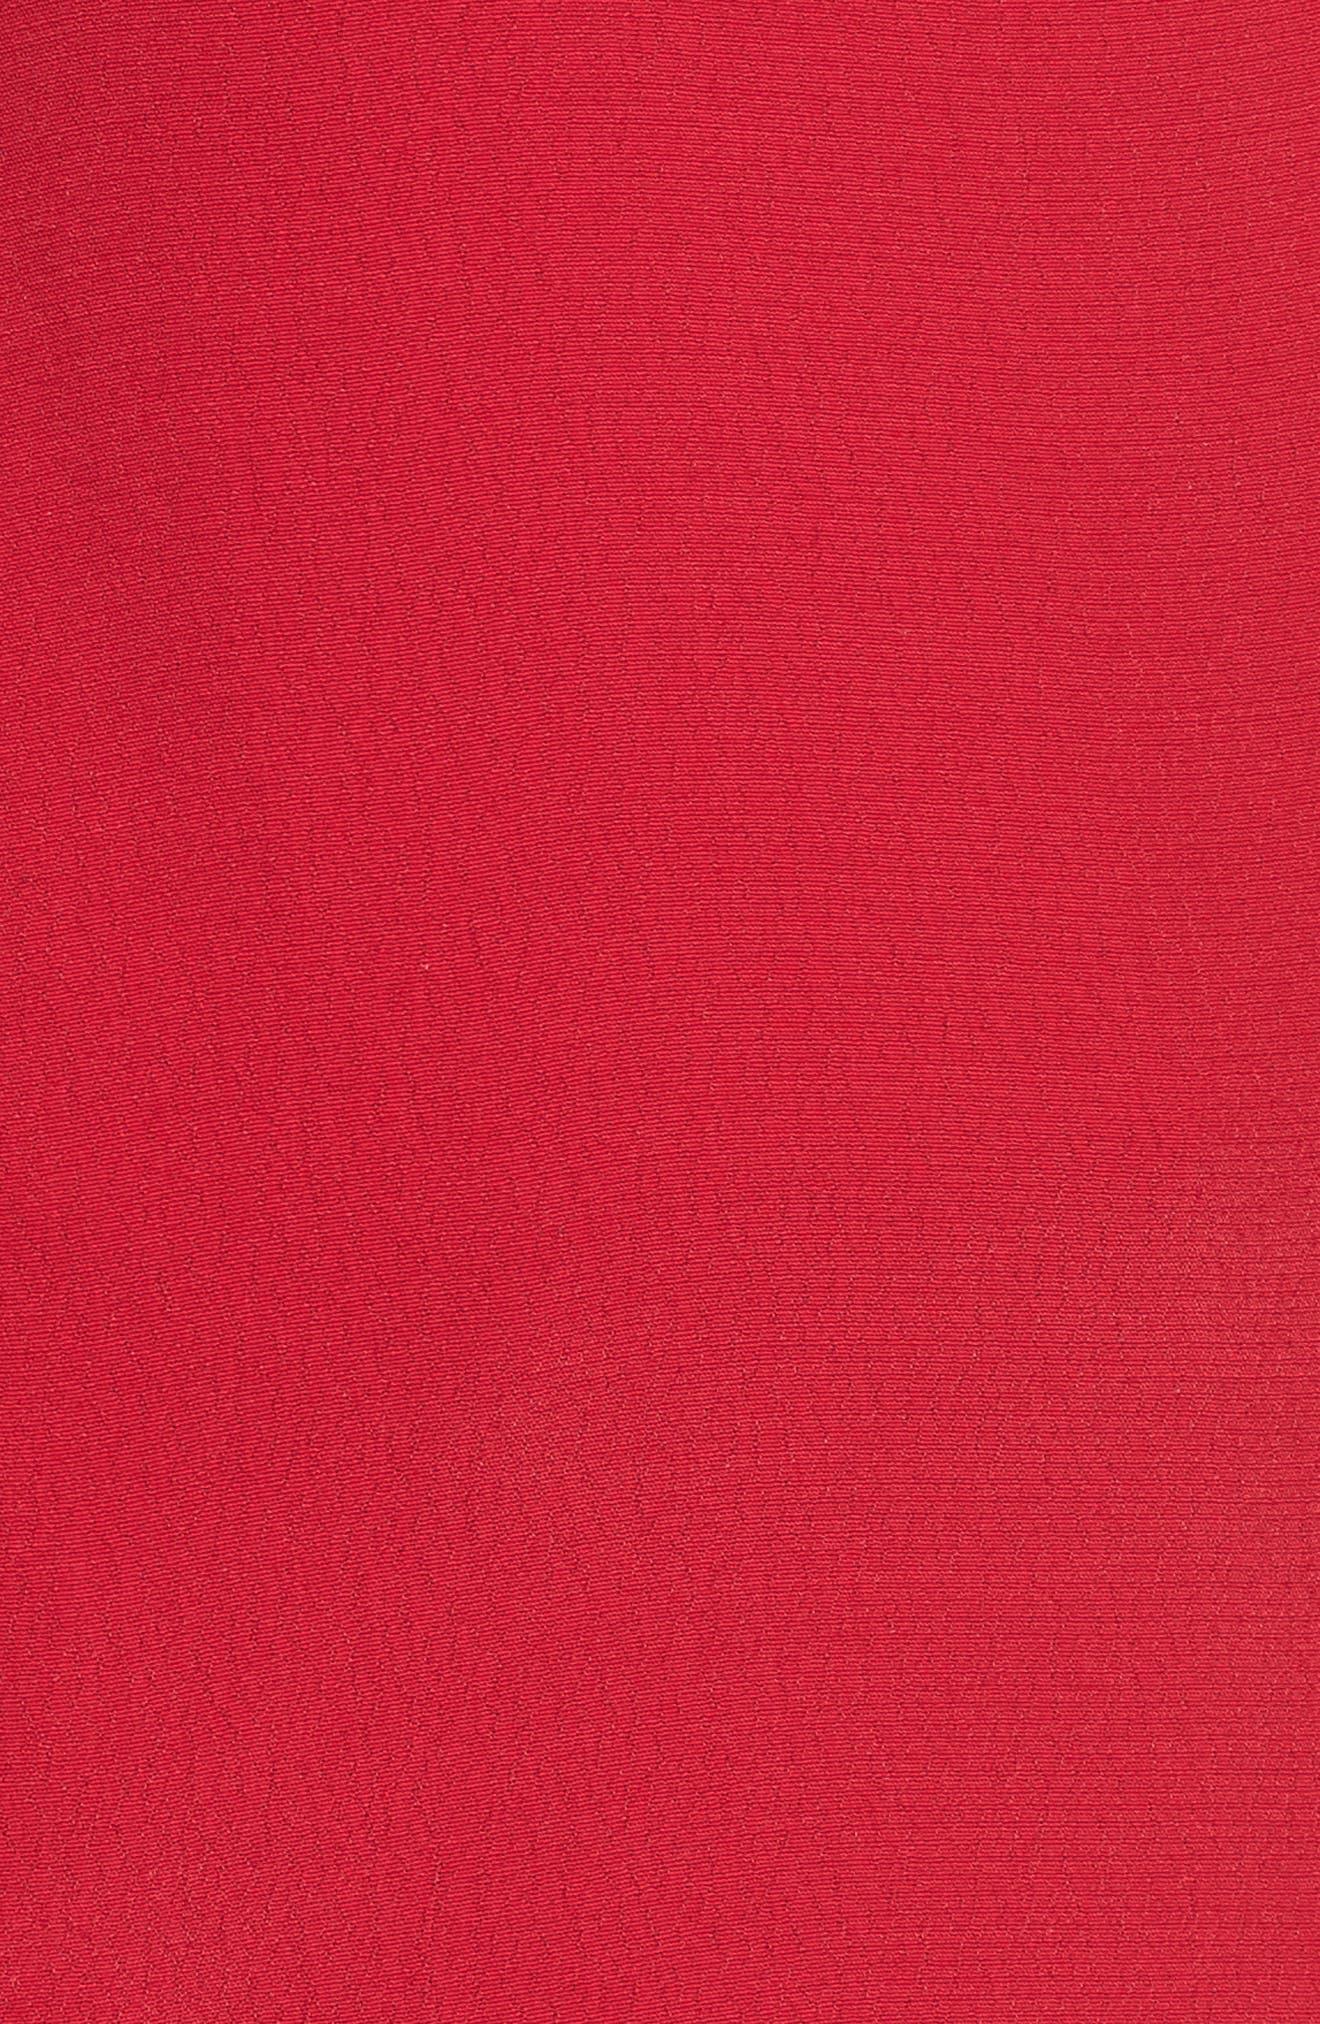 Cherry Nights Ruffle Sleeve Blouse,                             Alternate thumbnail 5, color,                             610